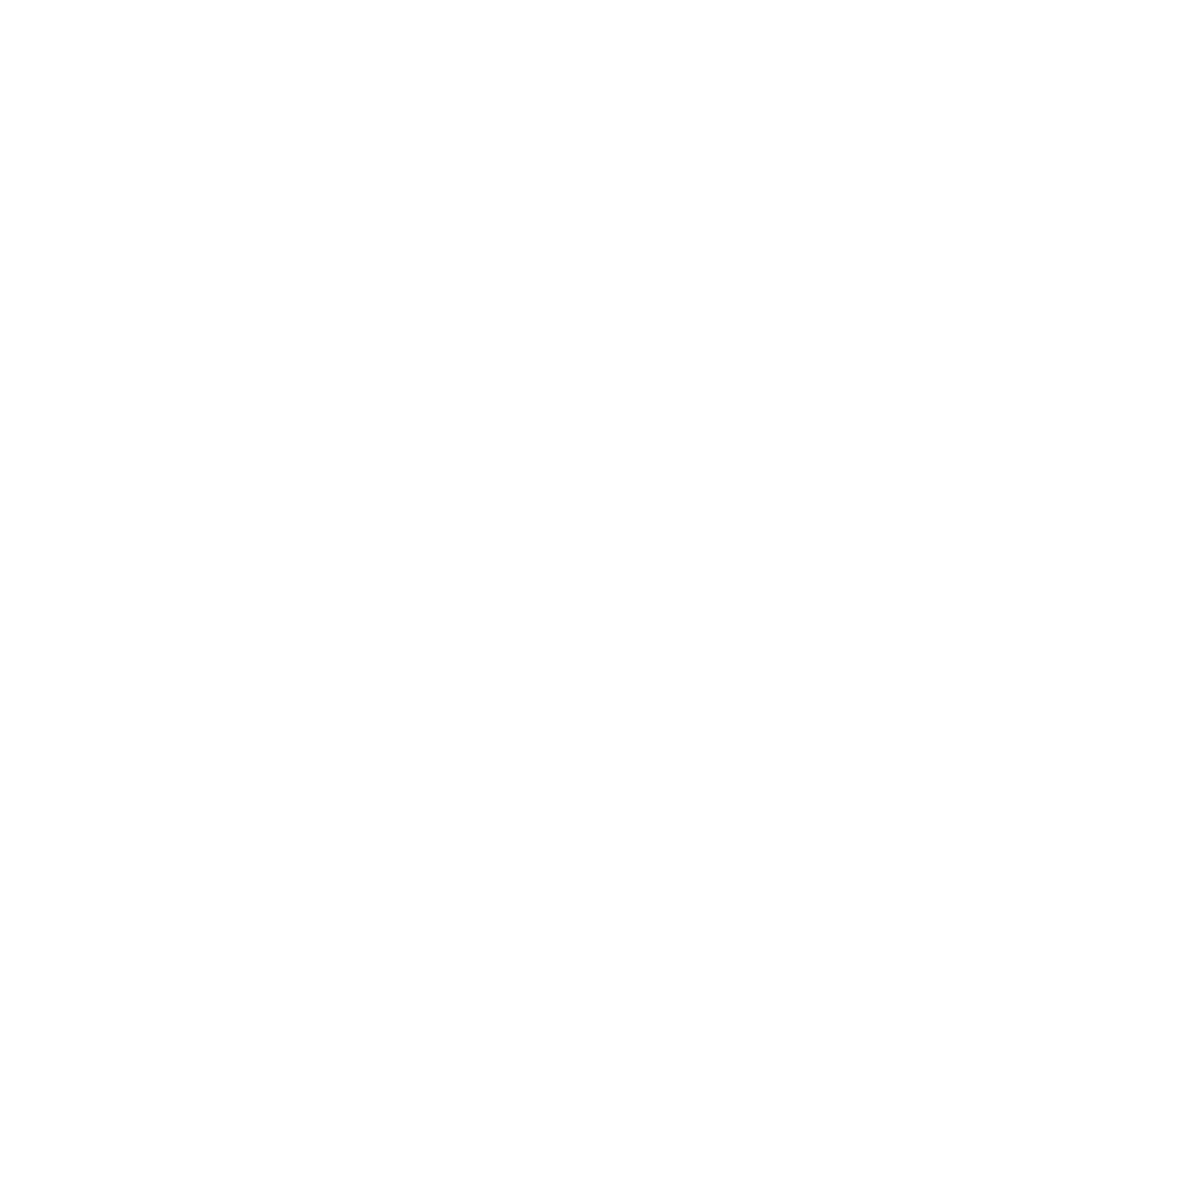 Check Mark Image